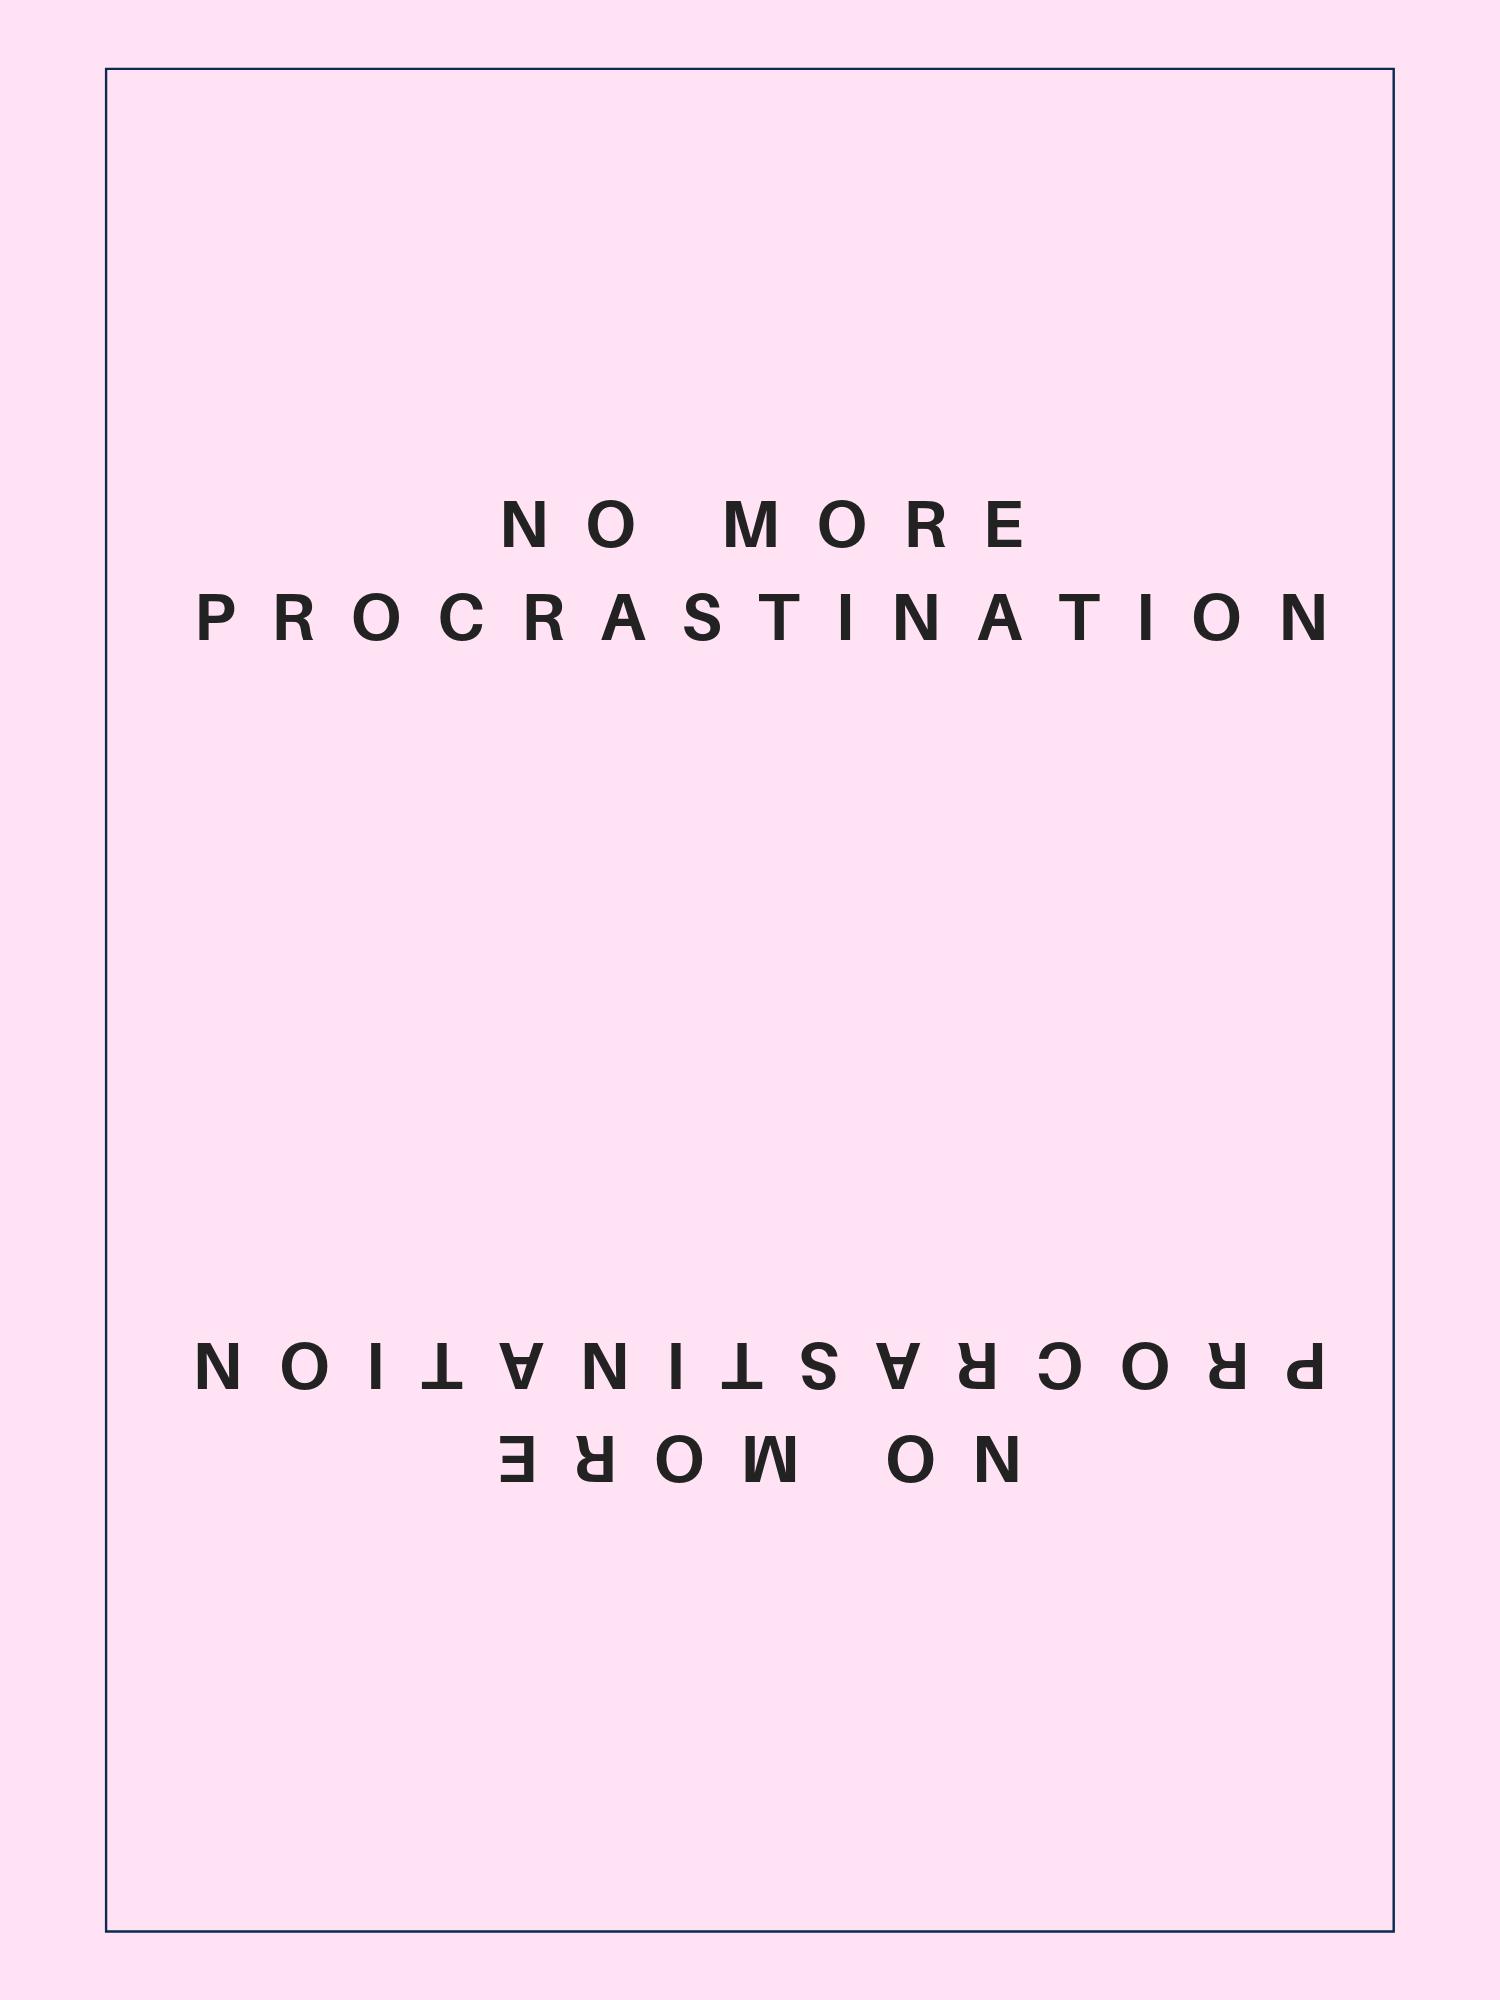 No more procrastination.png